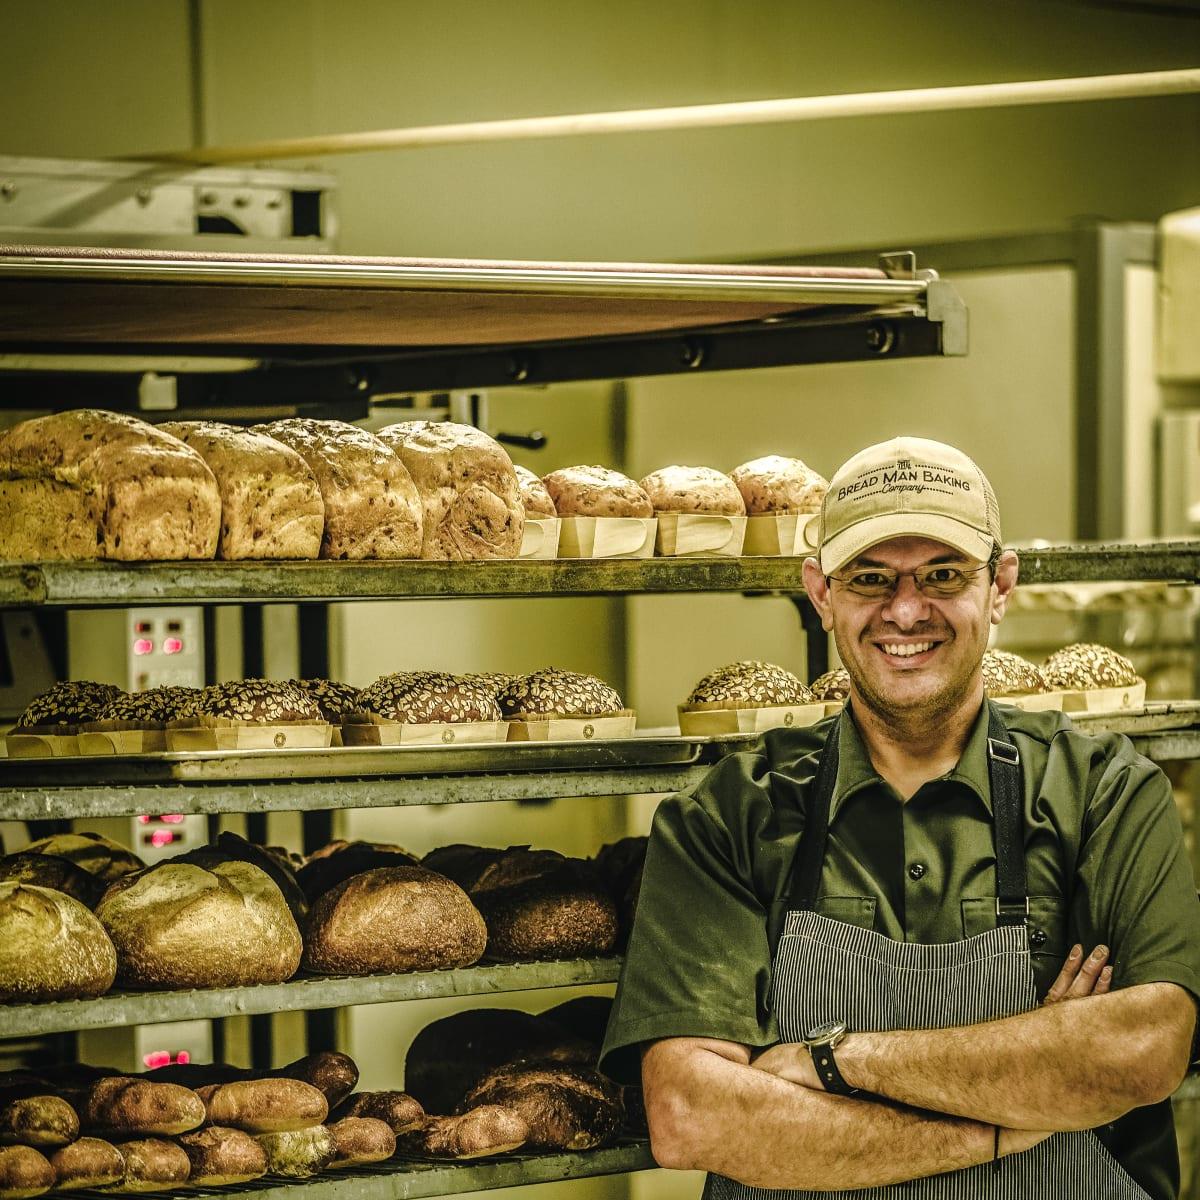 Tasos Katsaounis Bread Man Baking Company